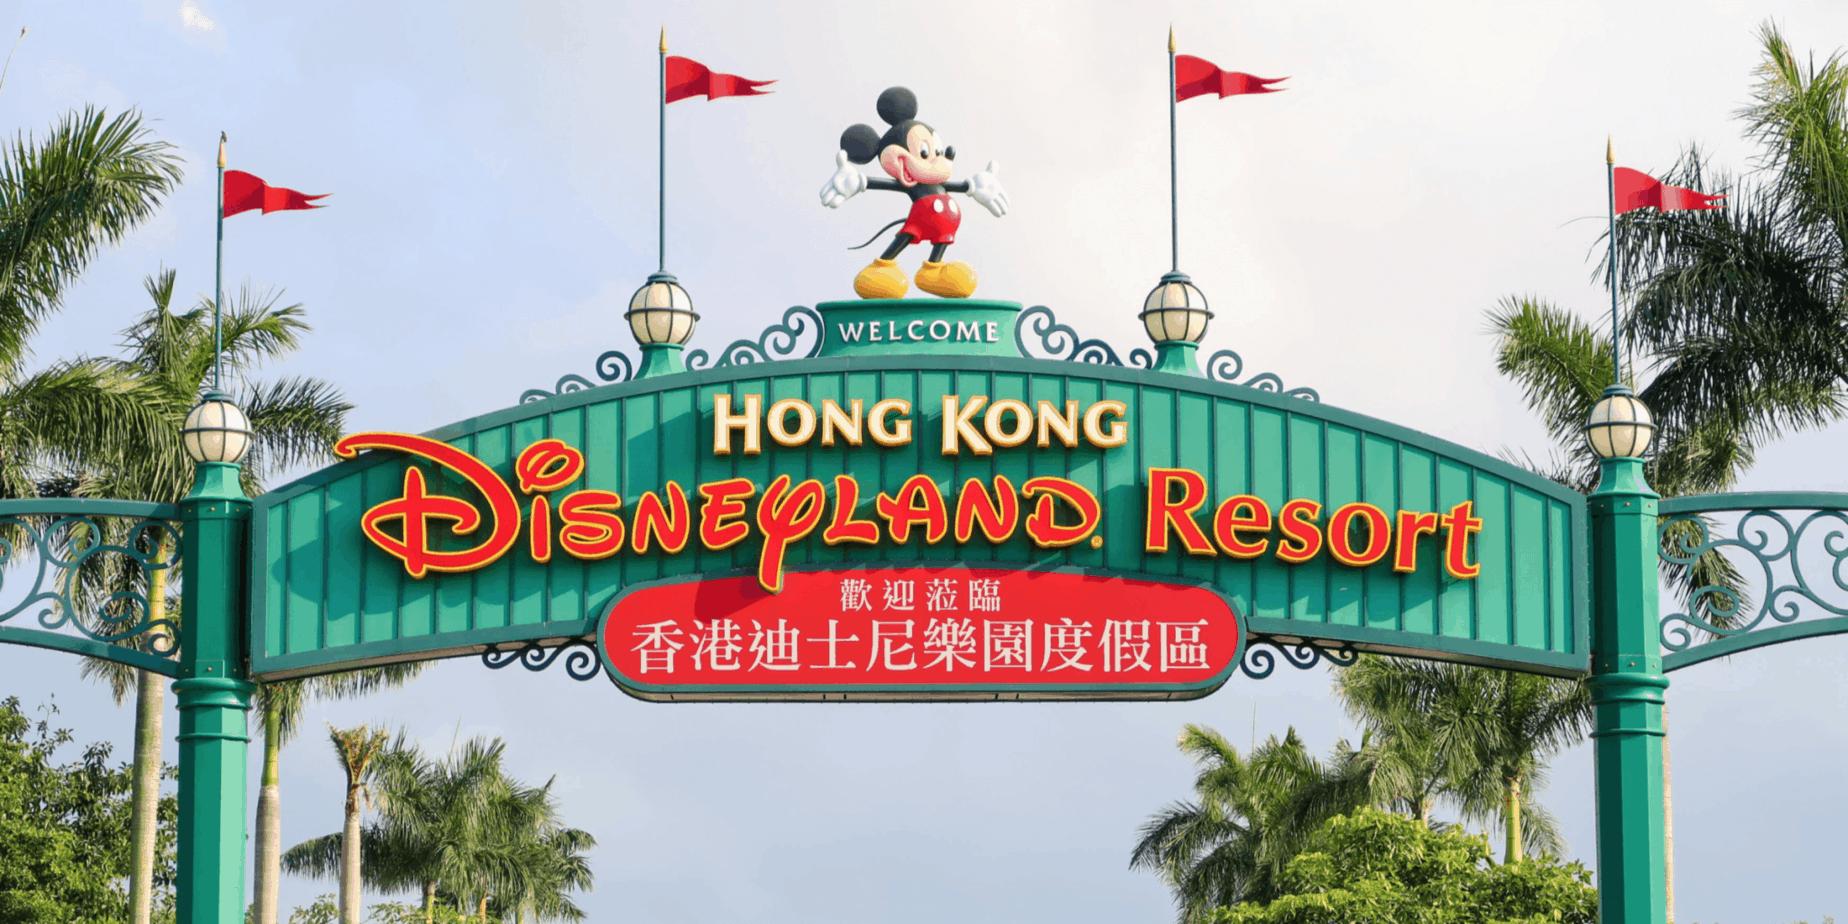 Our Best Hong Kong Disneyland Trip Planning Articles